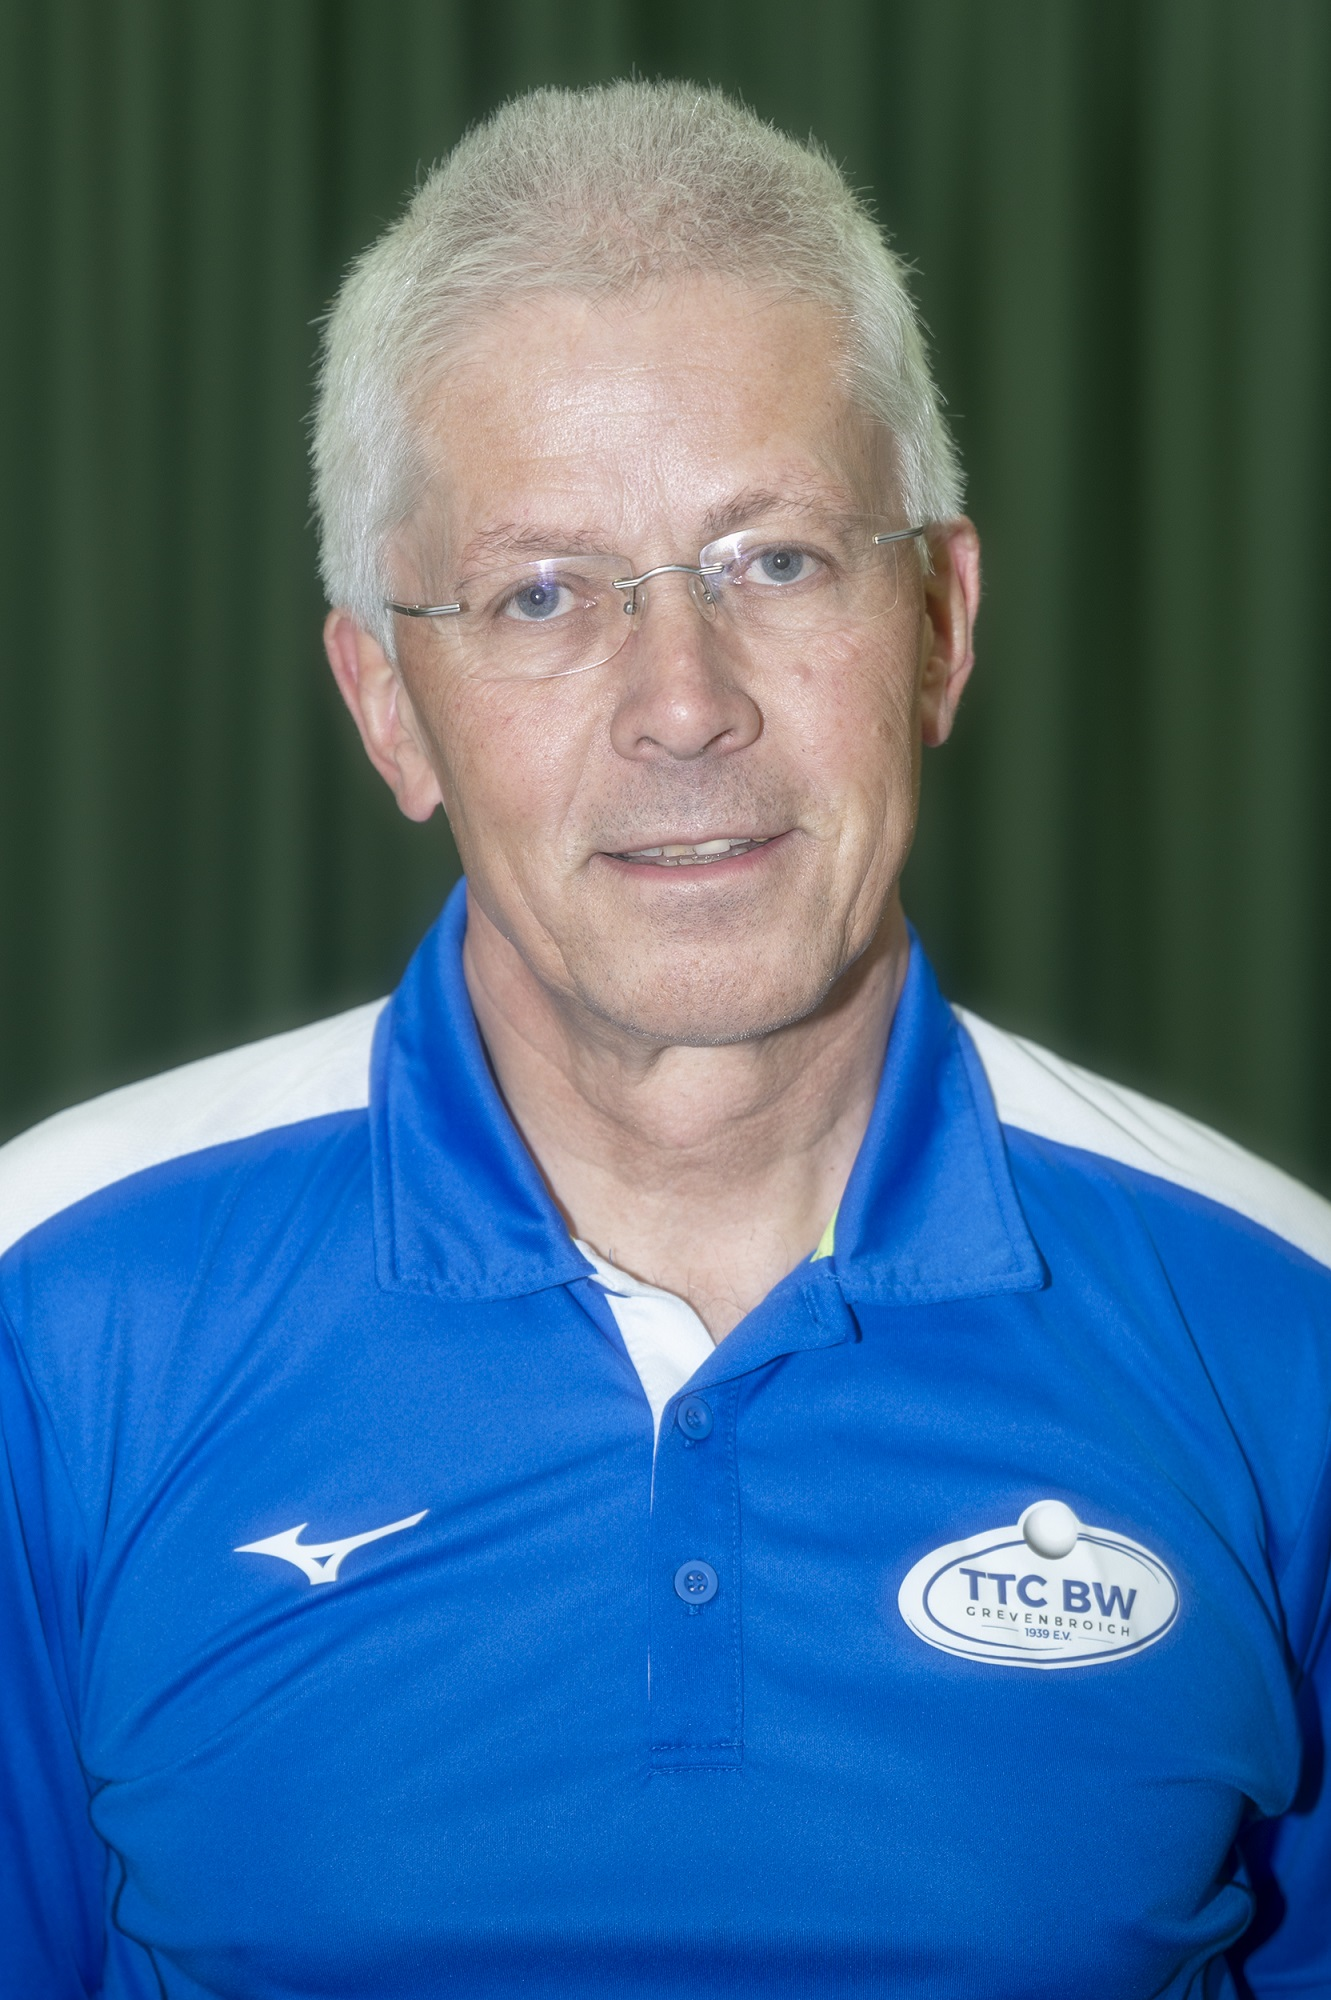 Ralf Mohrmann